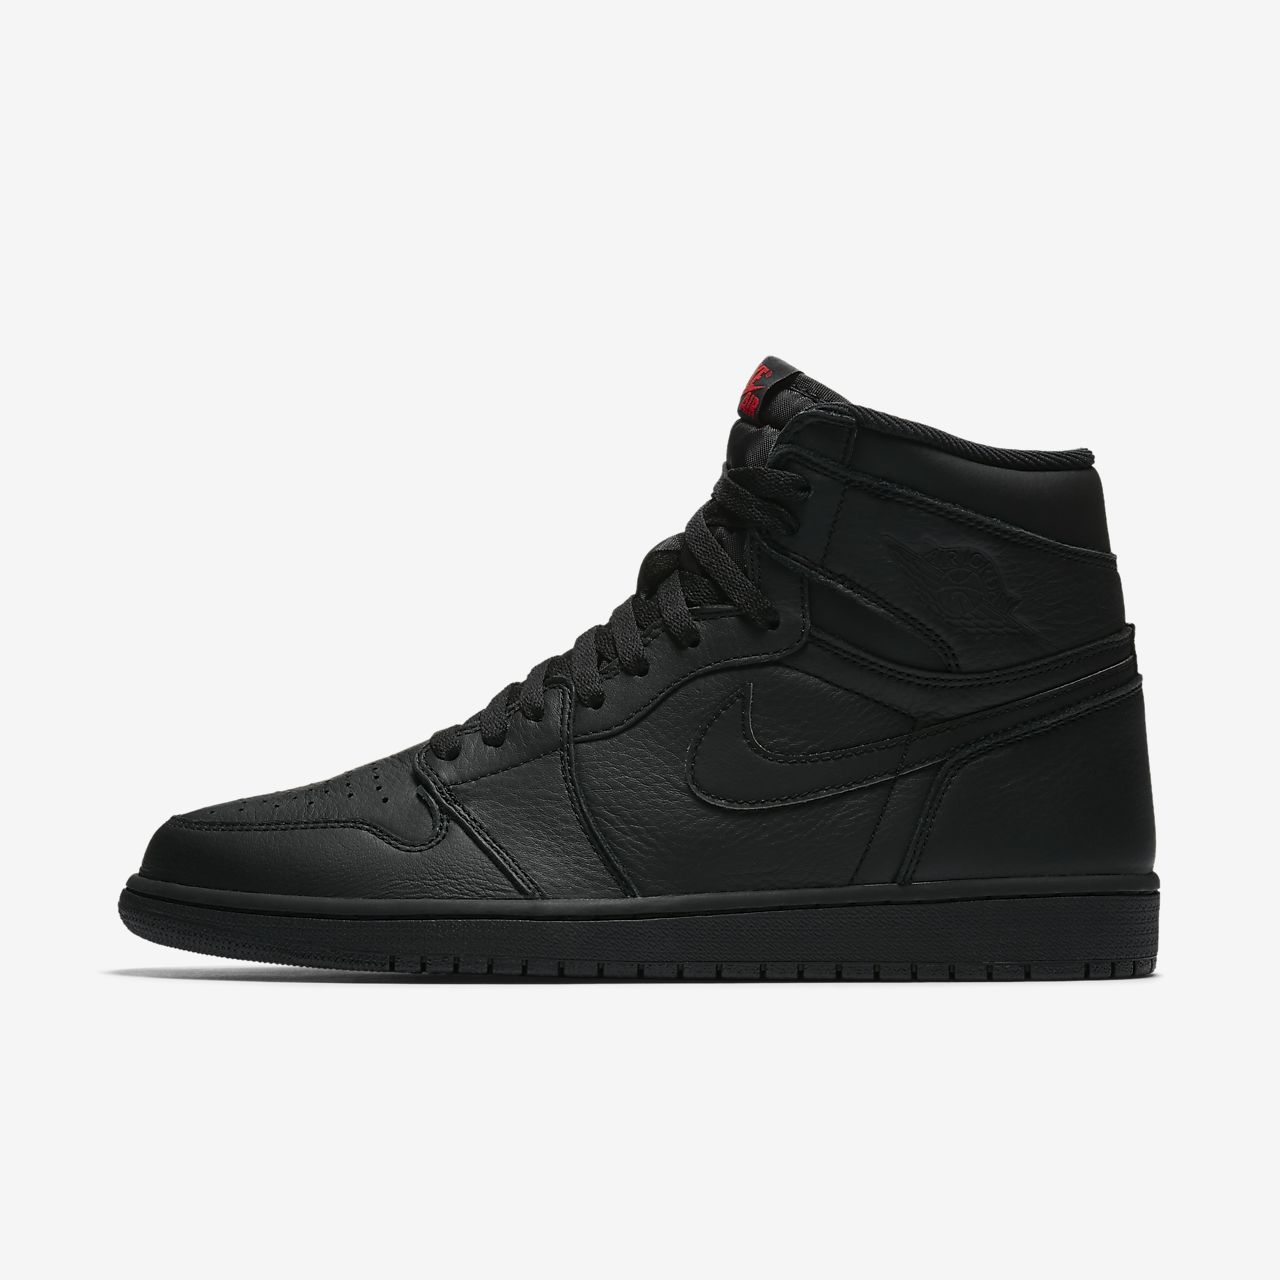 ... Air Jordan 1 Retro High OG Shoe